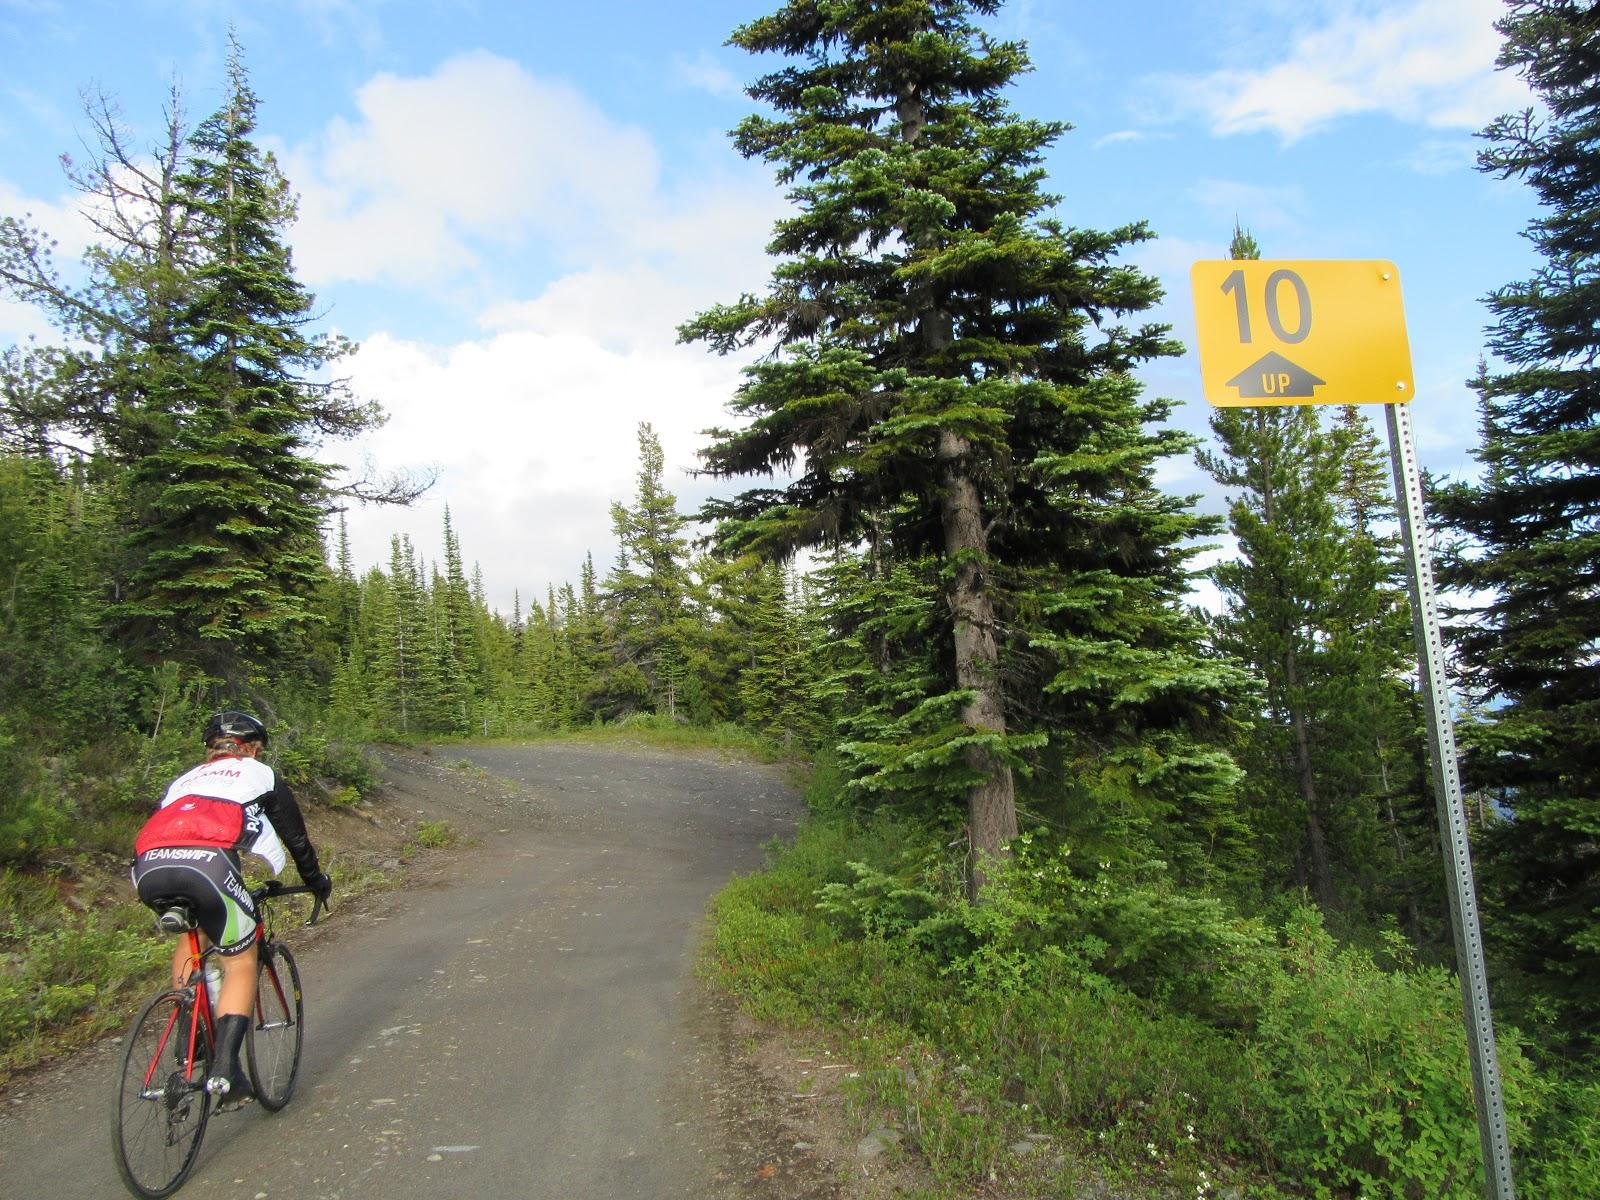 Climbing McBride Peak by bike - cyclist riding past kilometer sign